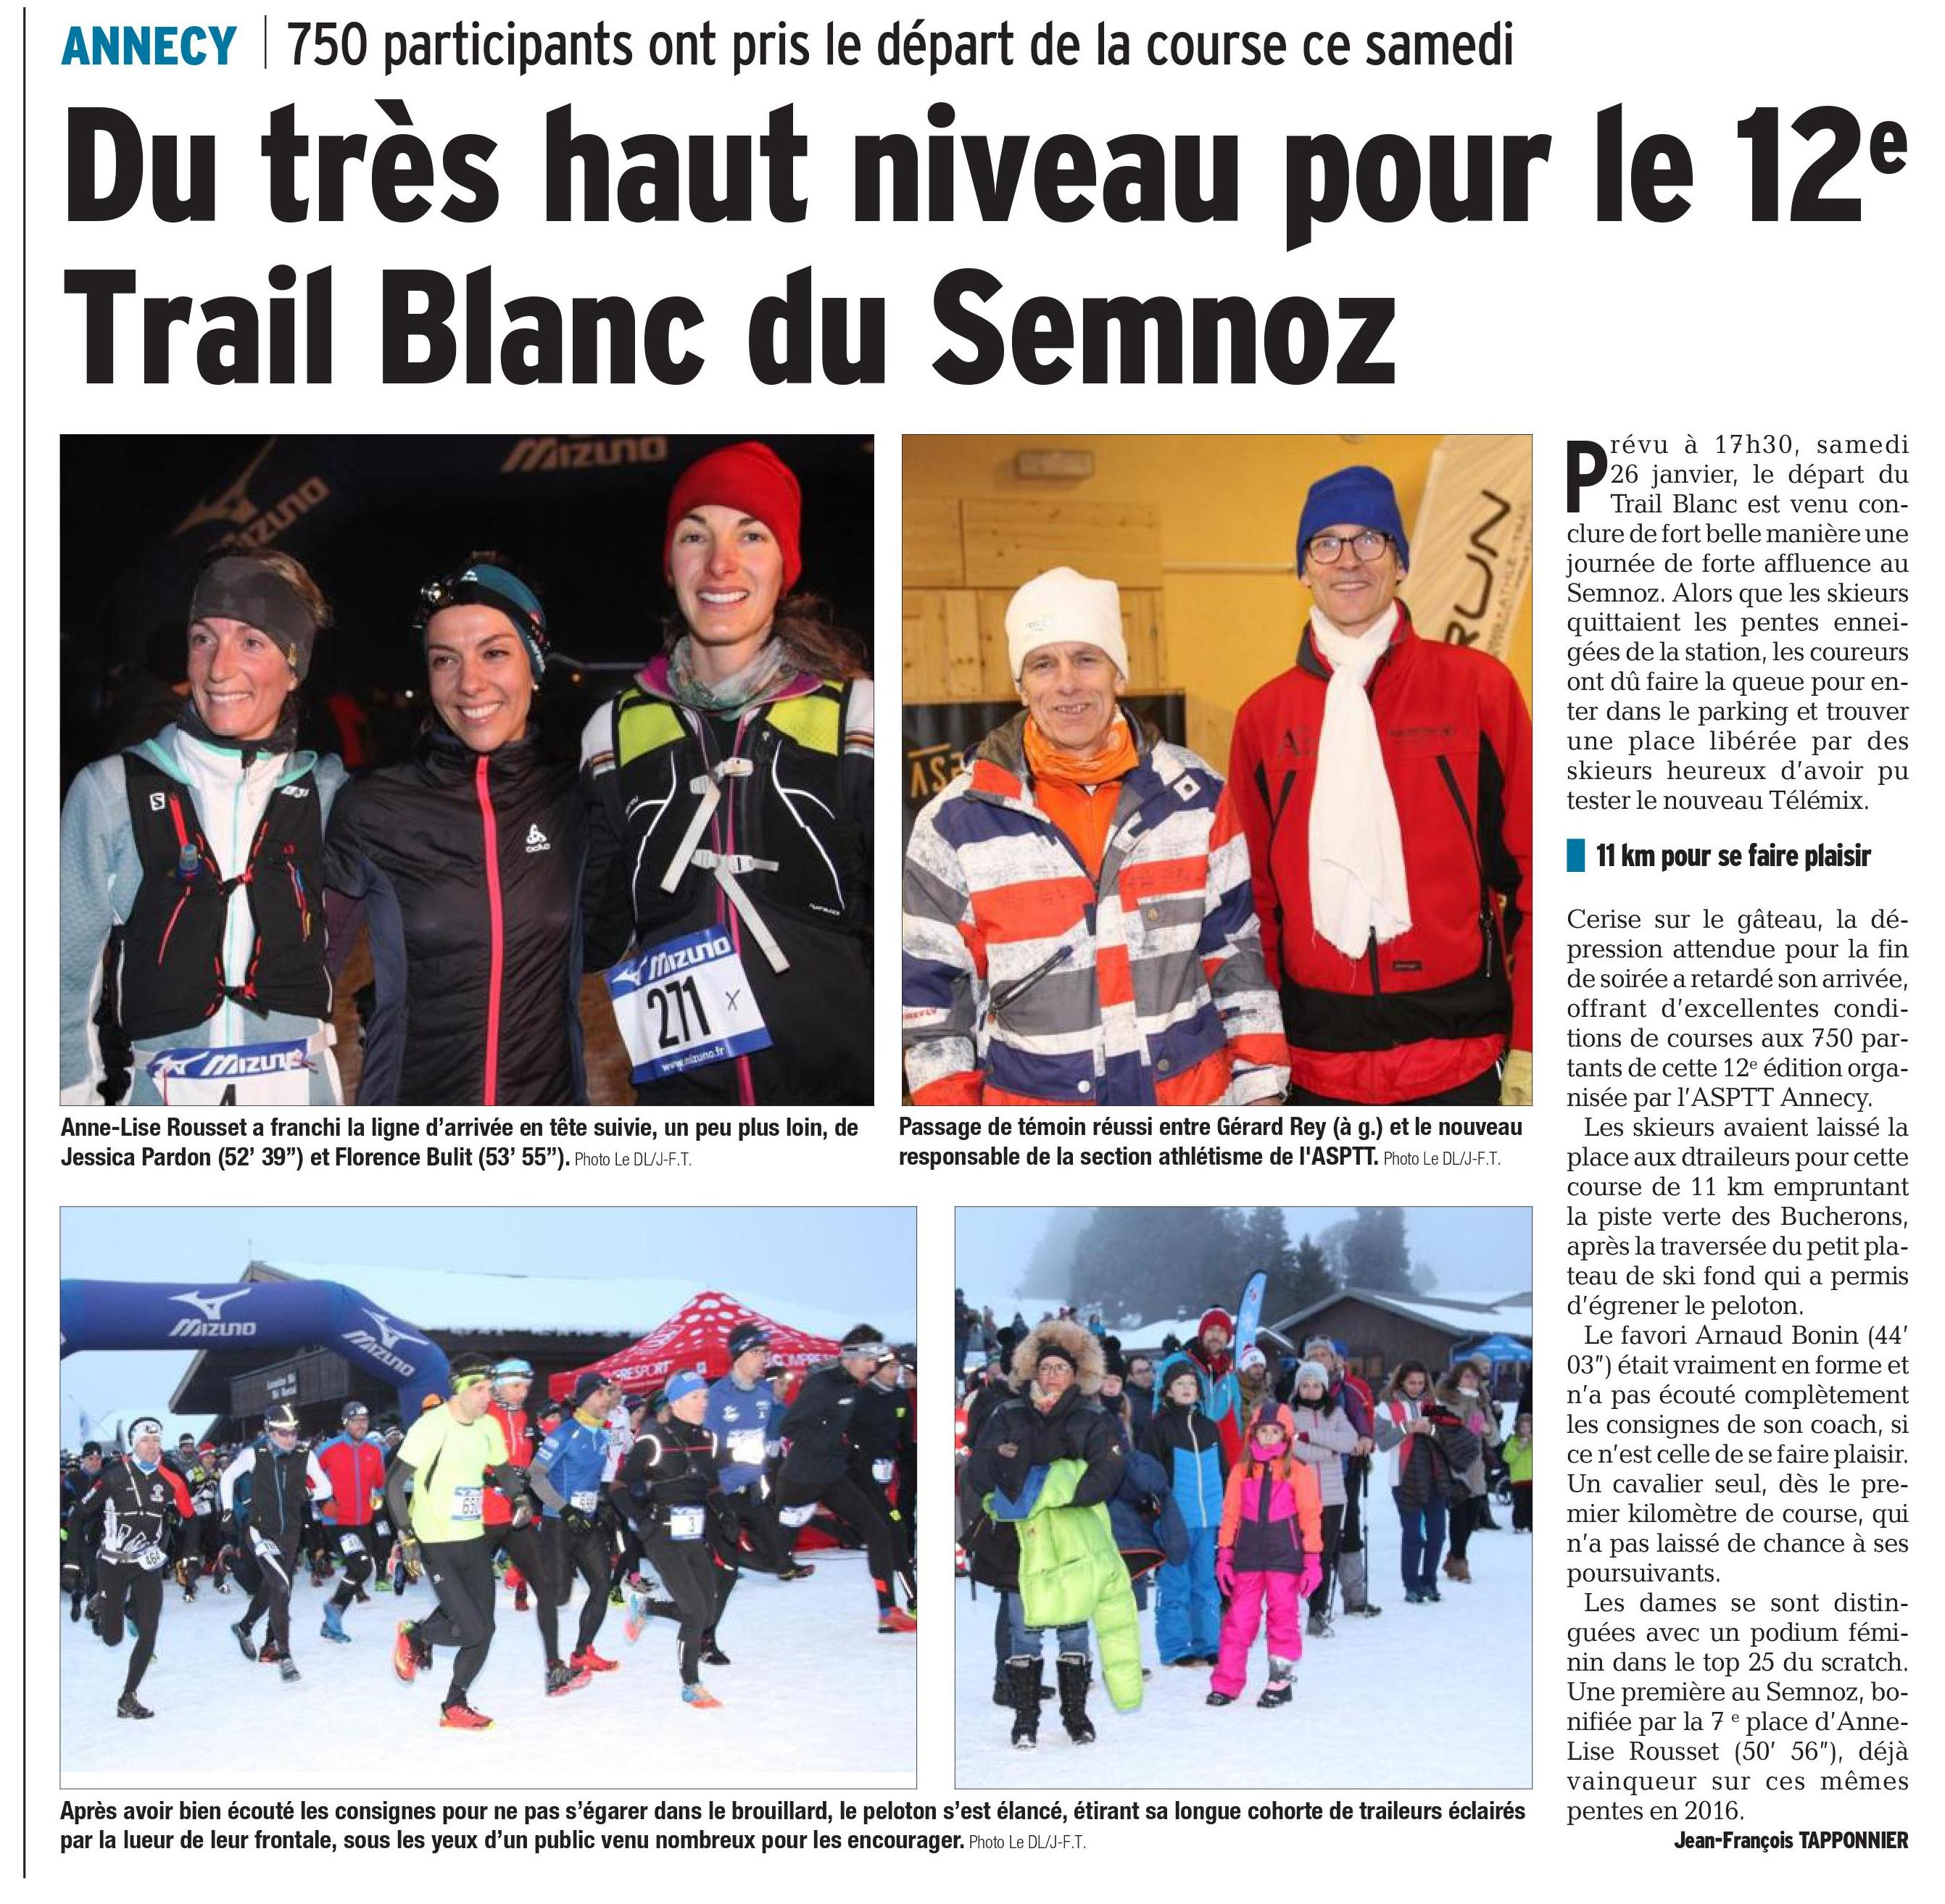 0001 3 - RÉSULTATS DU TRAIL BLANC DU SEMNOZ (74) 26/01/2019